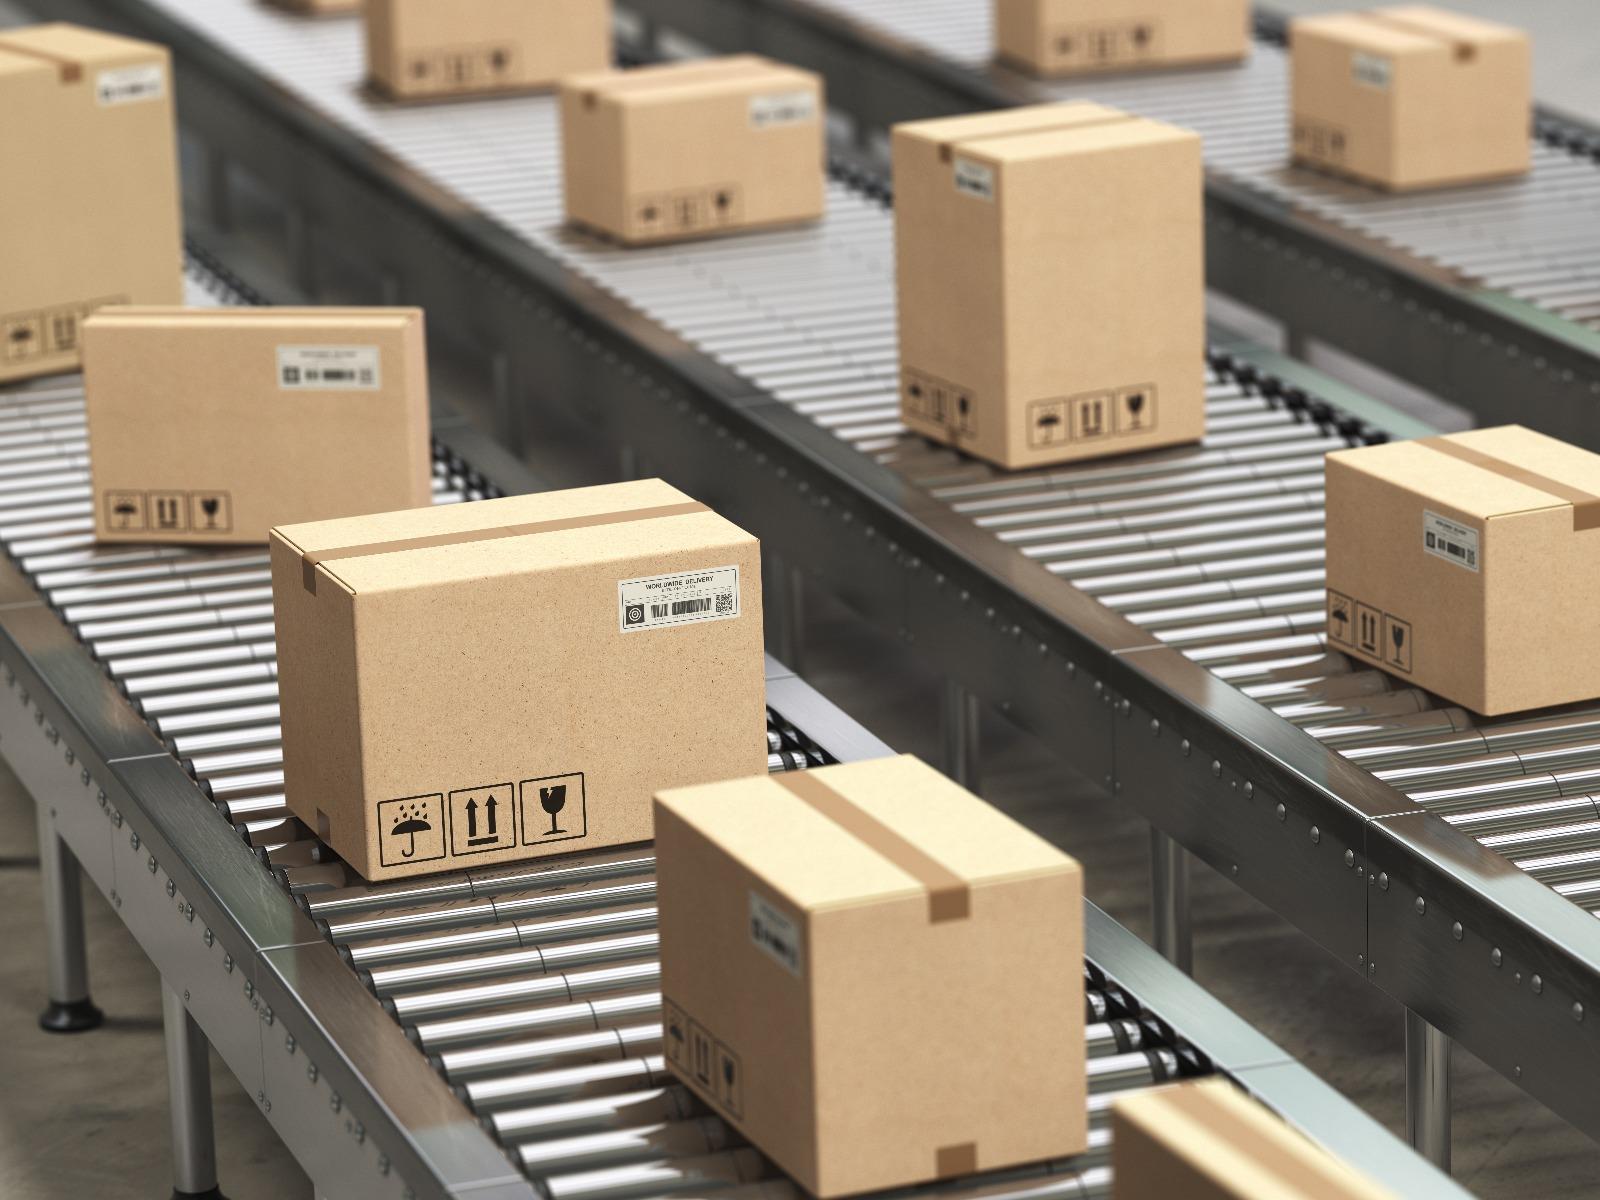 corrugated boxes traveling on conveyor belts